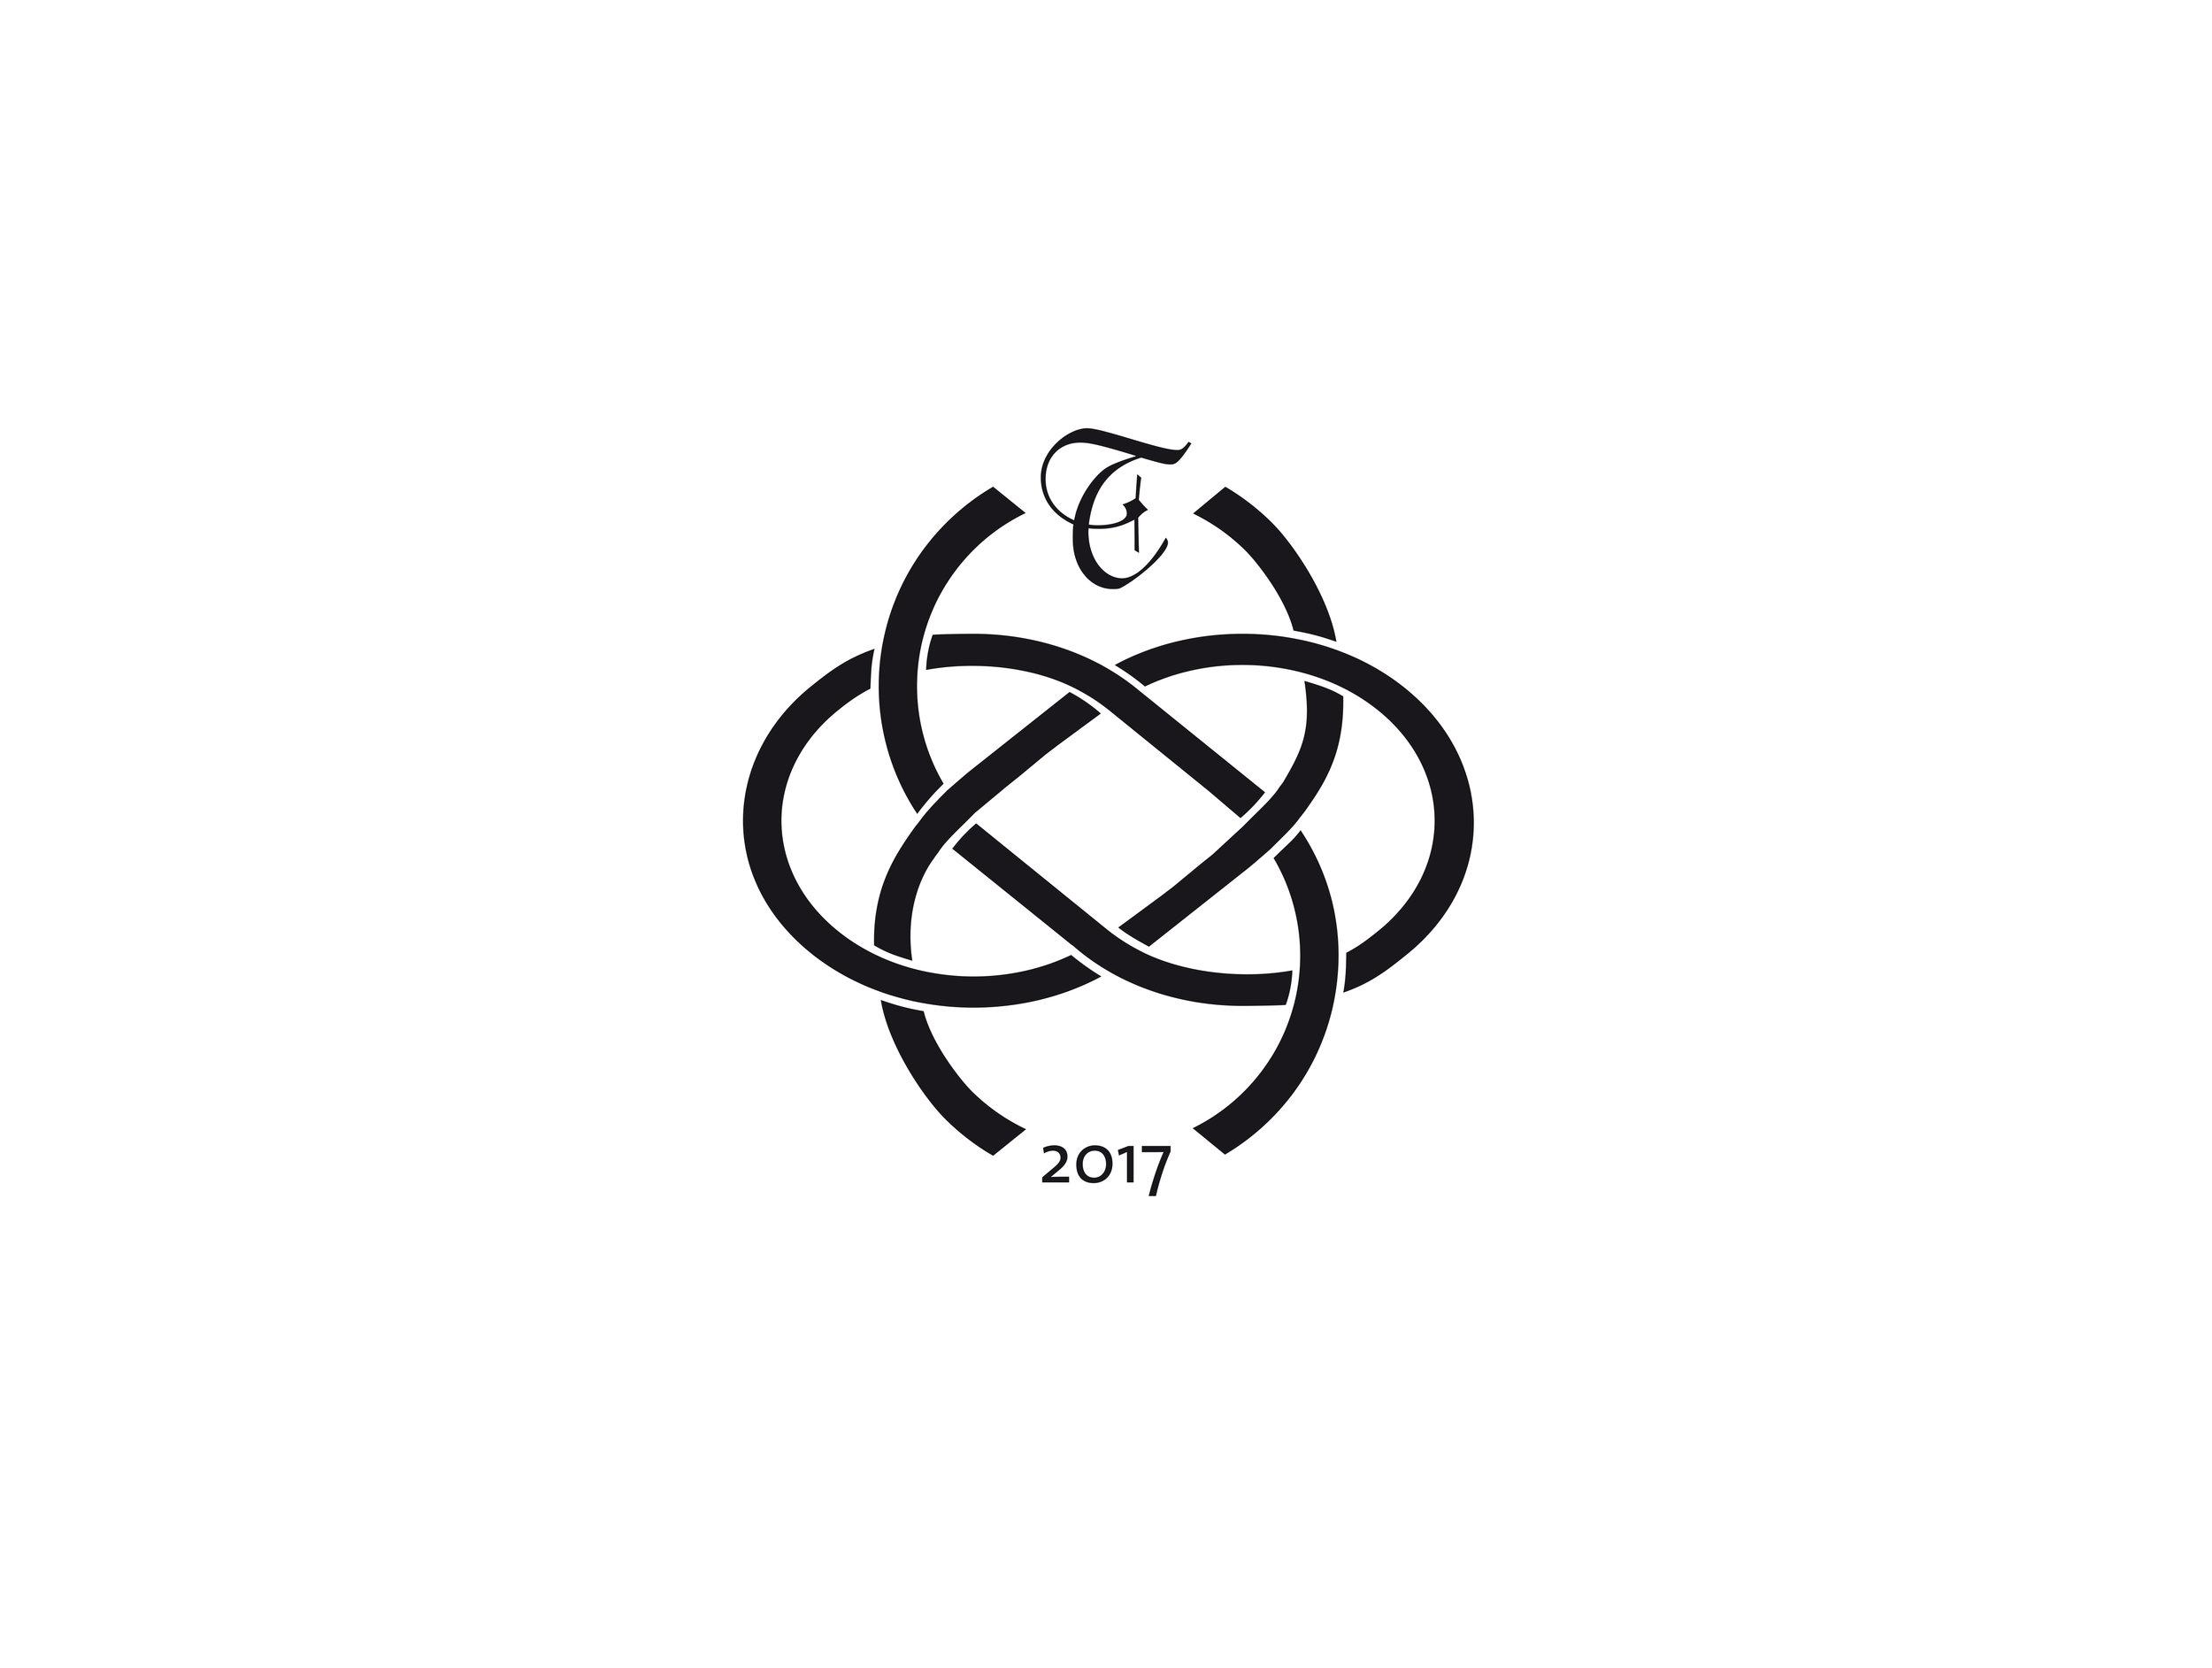 tiz inklusion logo.jpg